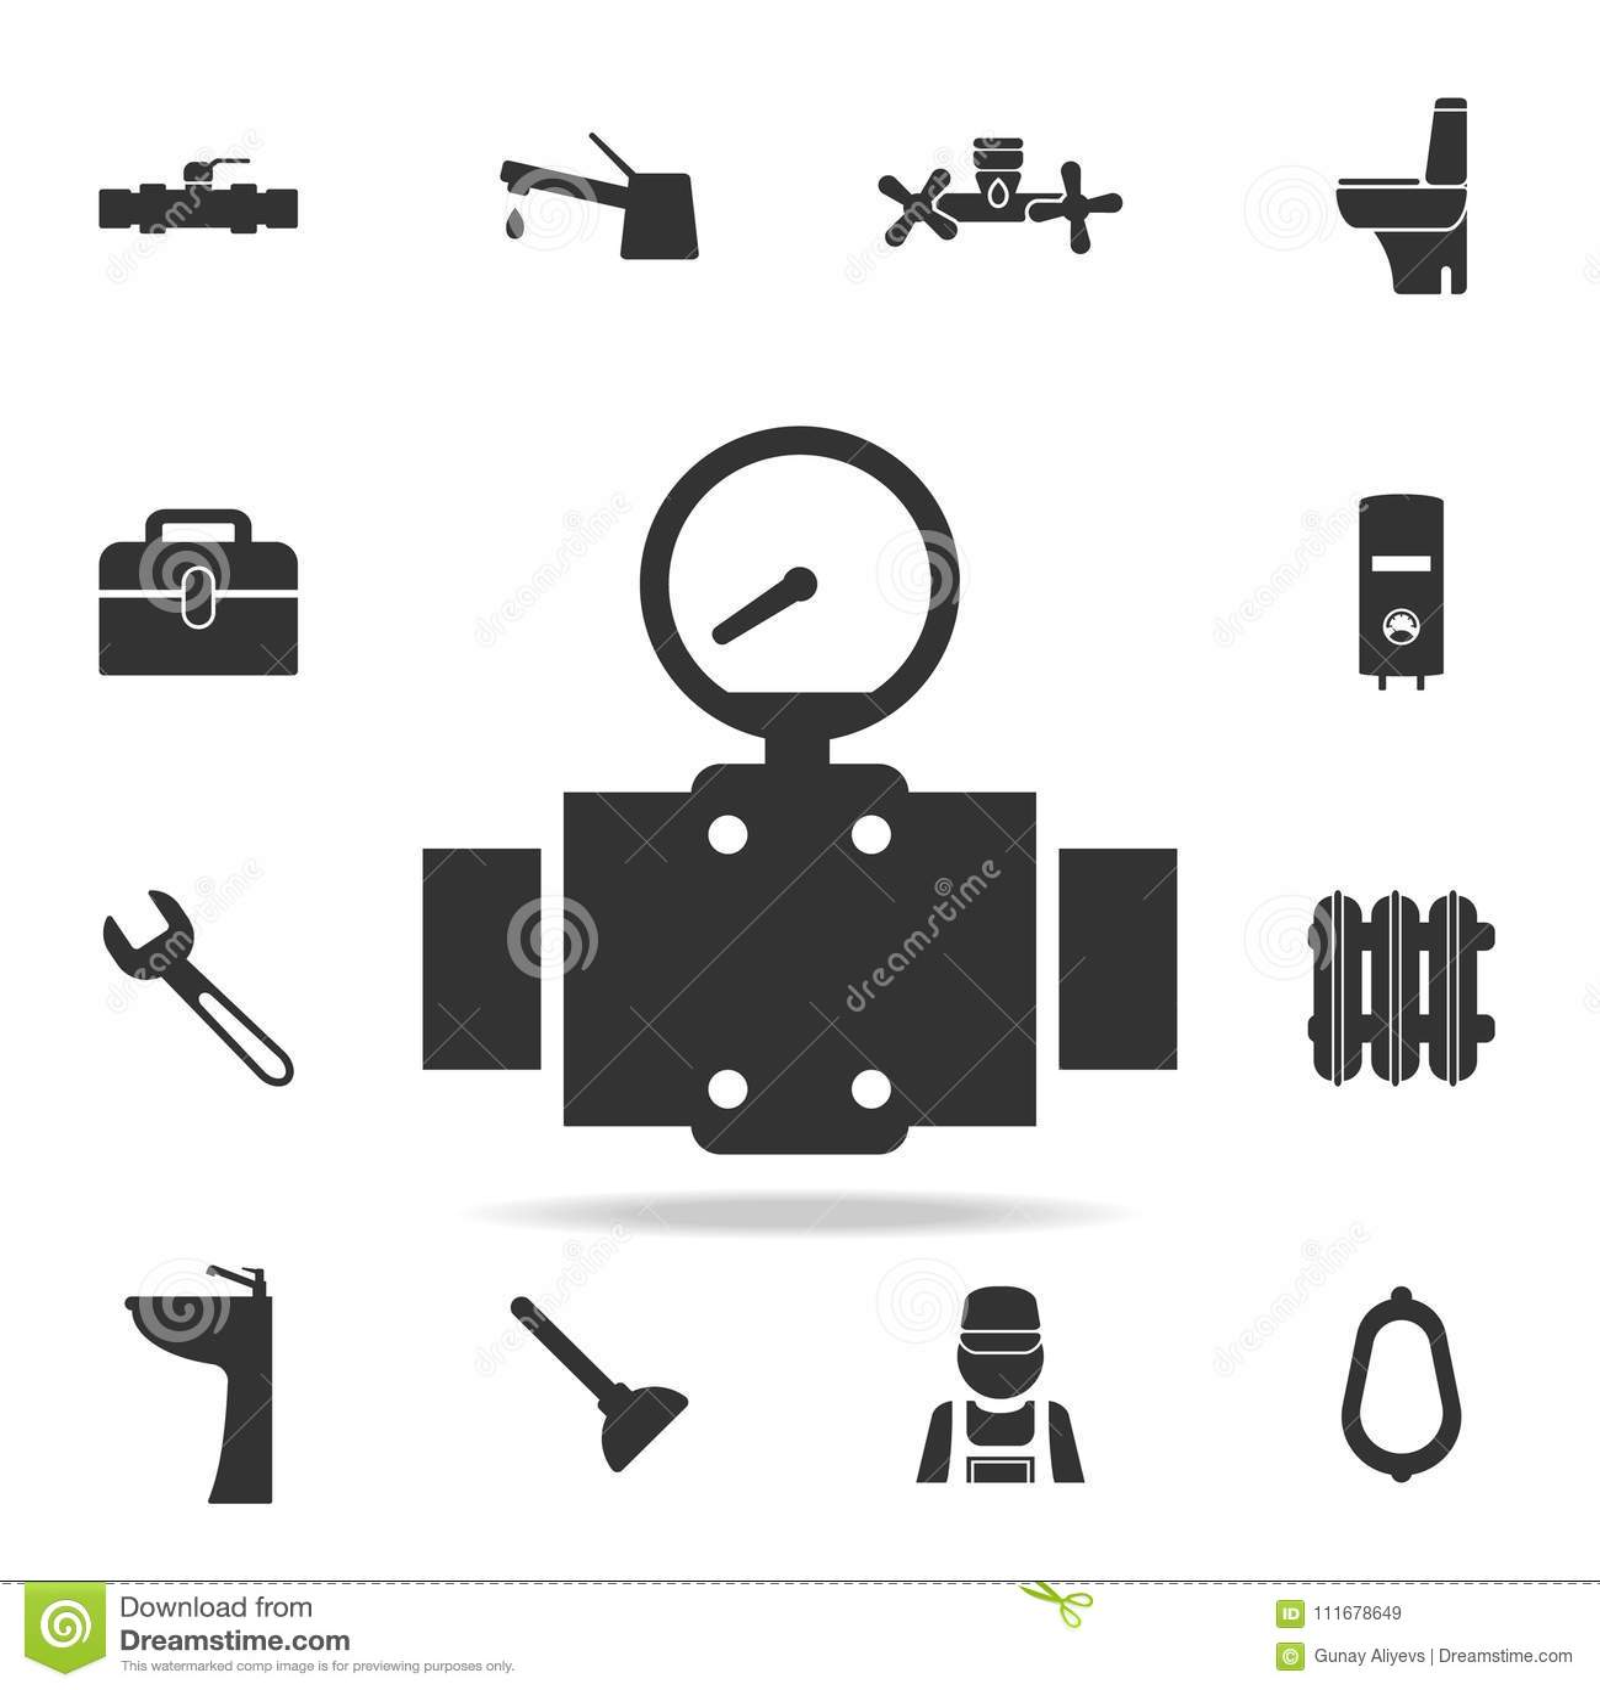 Dorable Symbol For Pressure Switch Motif - Wiring Diagram Ideas ...